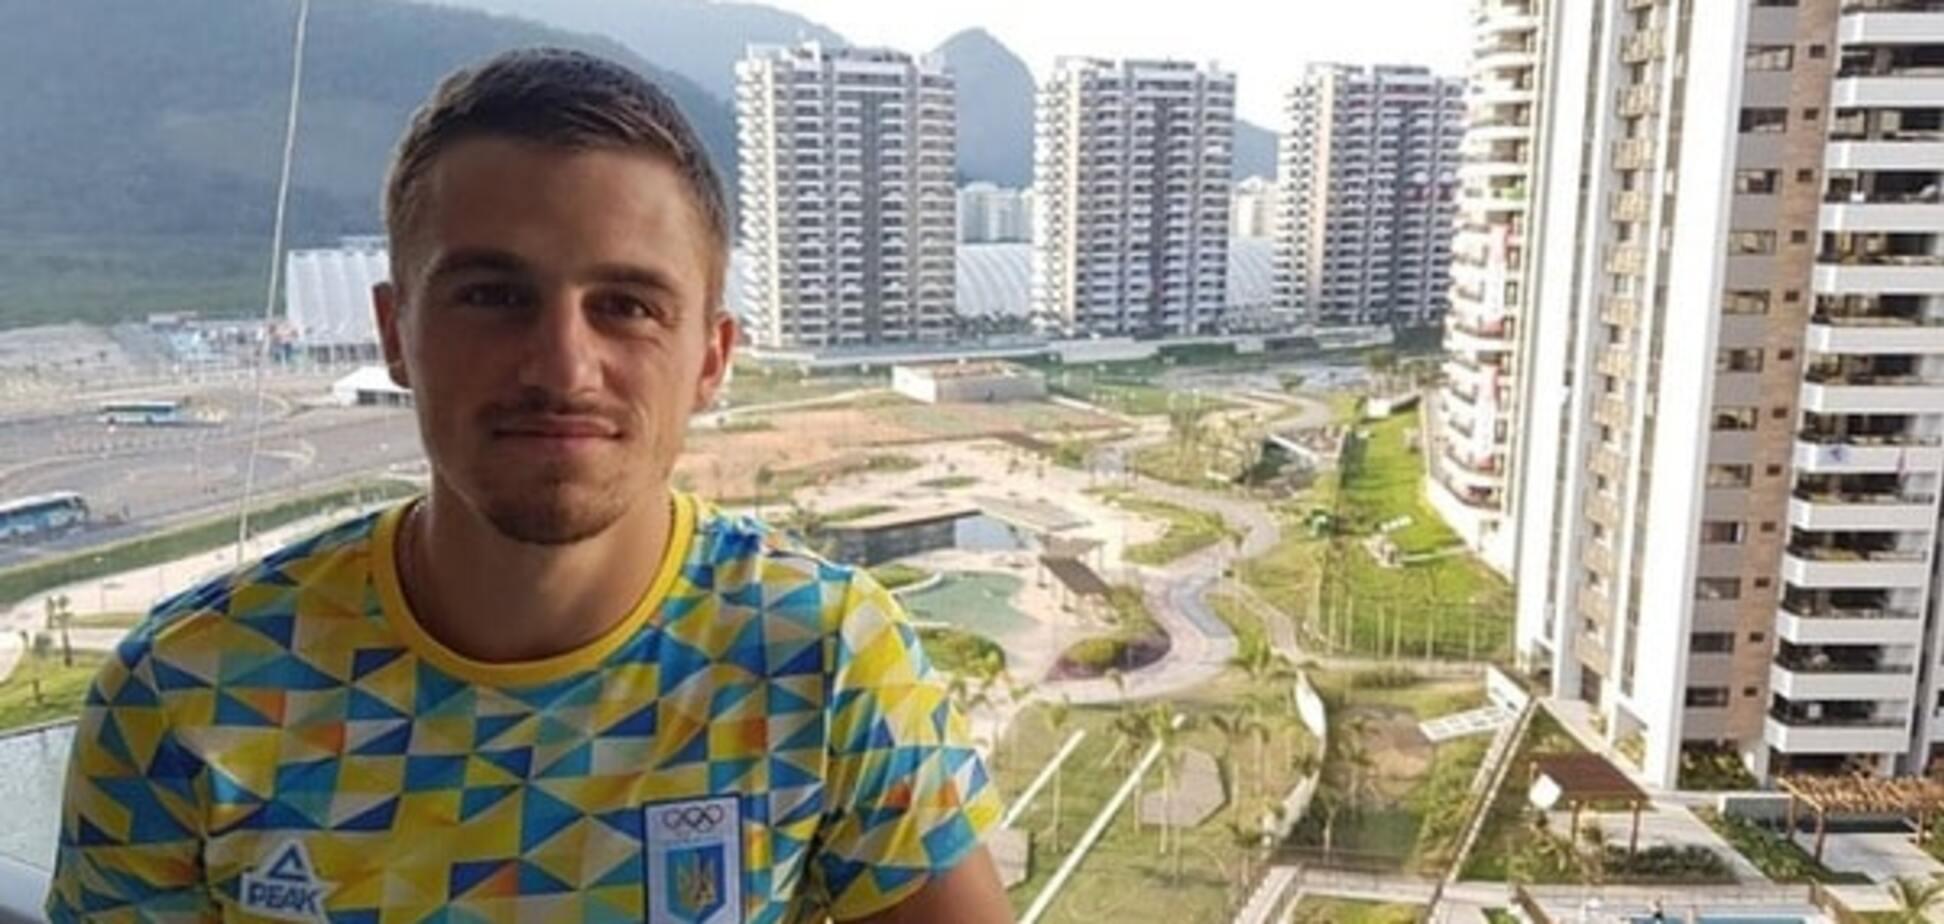 Украинскому призеру Олимпиады в Рио подарили квартиру за 850 000 грн